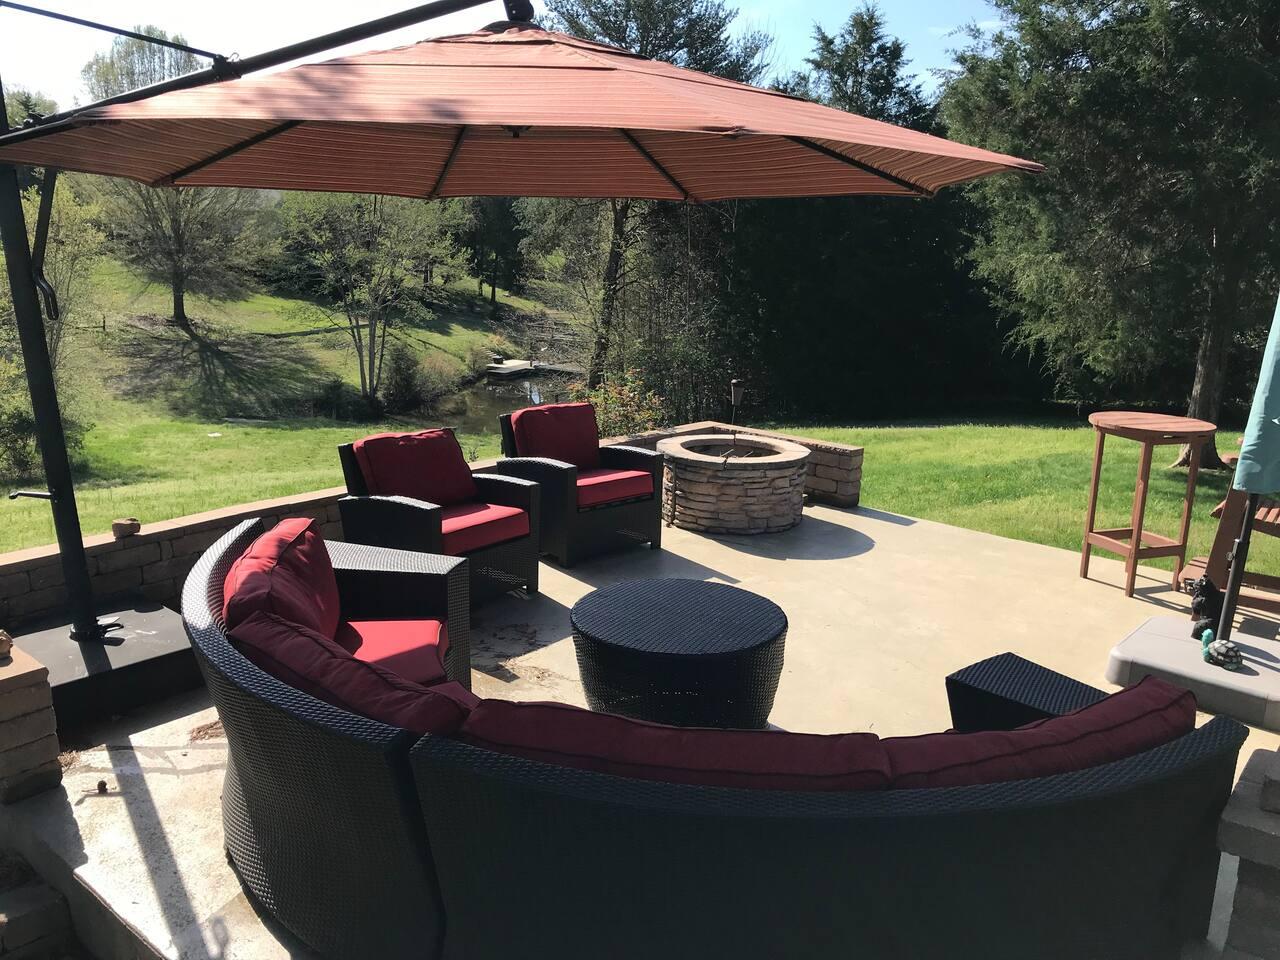 New patio furniture. Awesome 16' umbrella